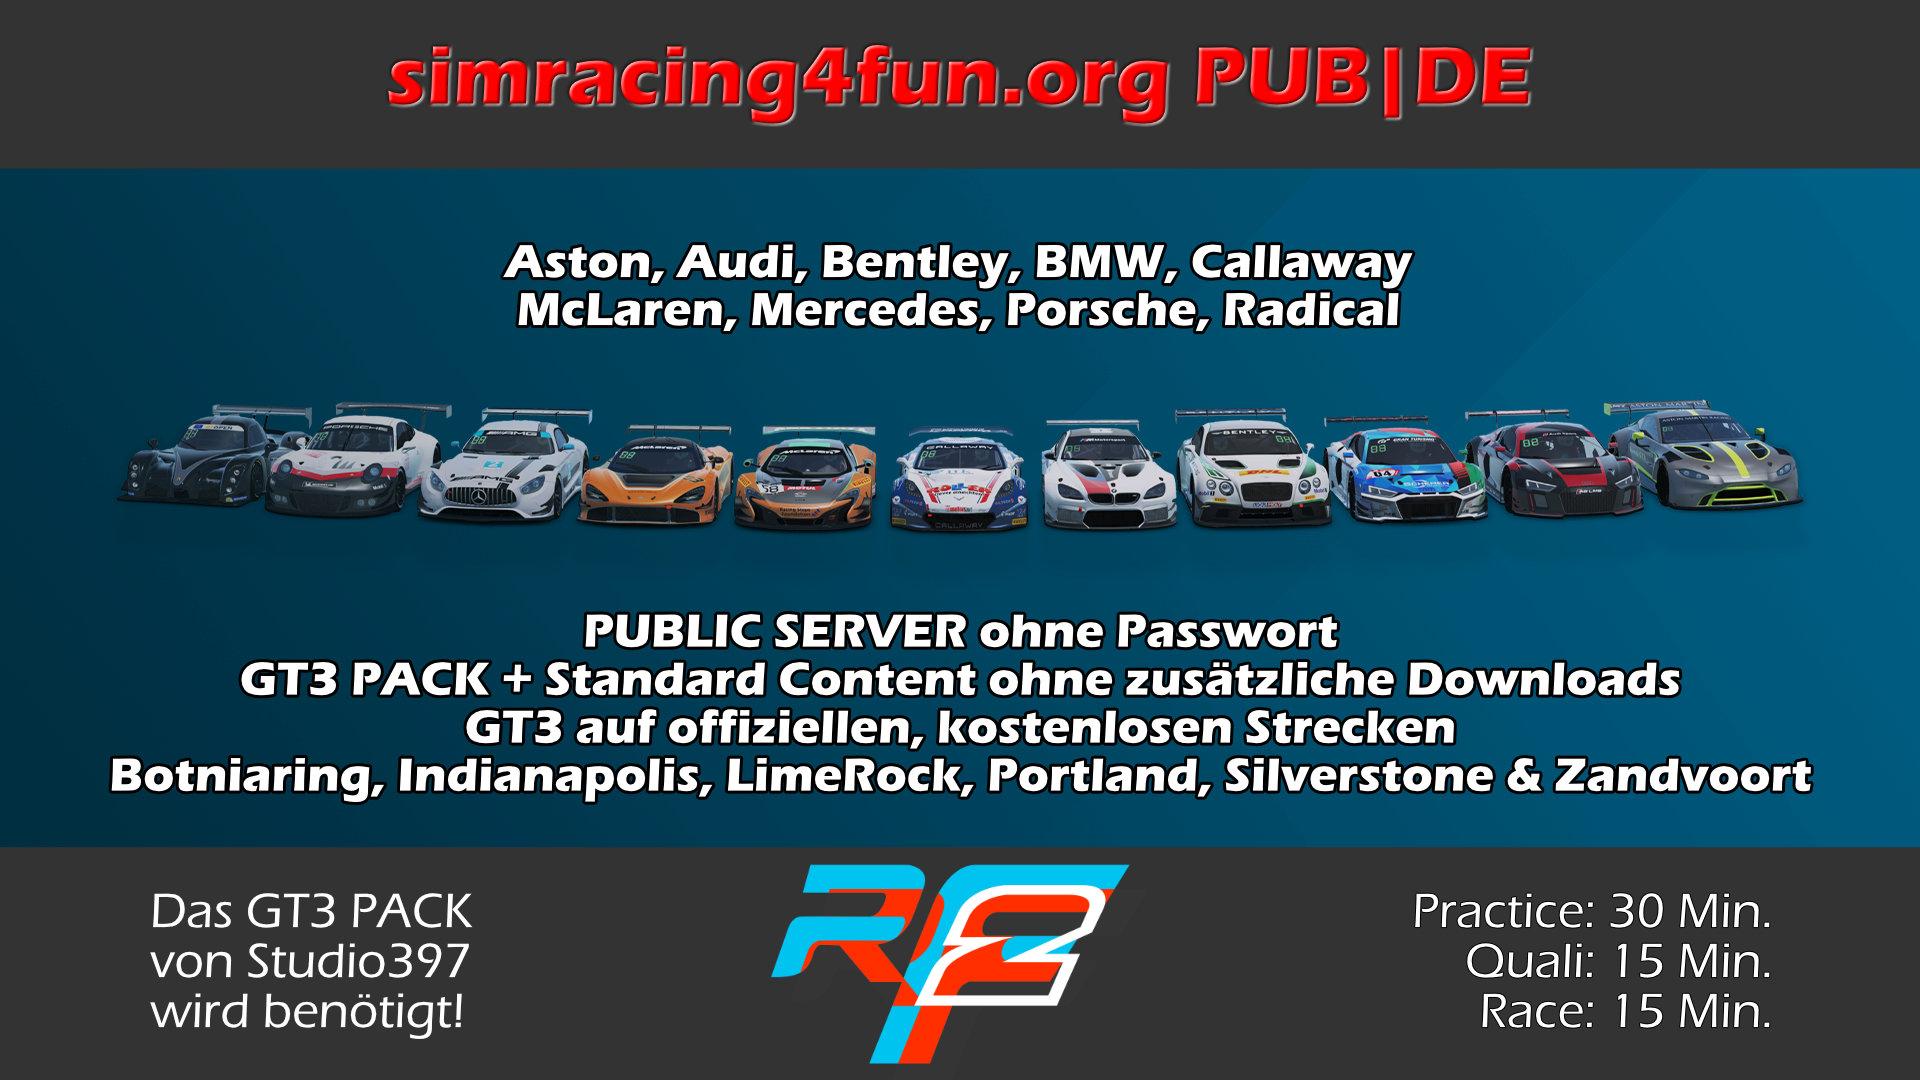 simracing4fun.org PUB|DE